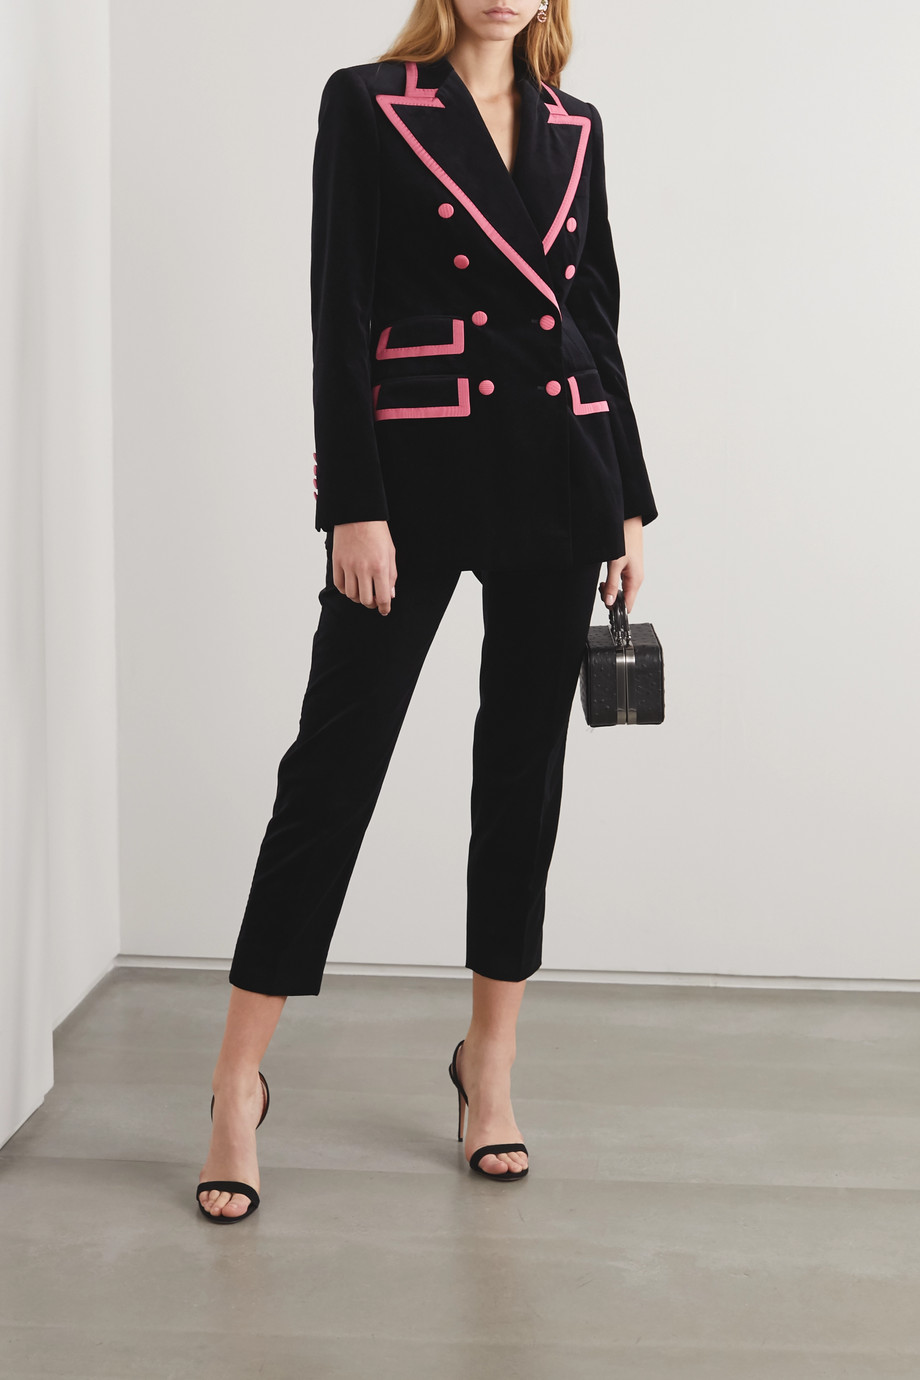 Dolce & Gabbana Two-tone double-breasted satin-trimmed velvet blazer